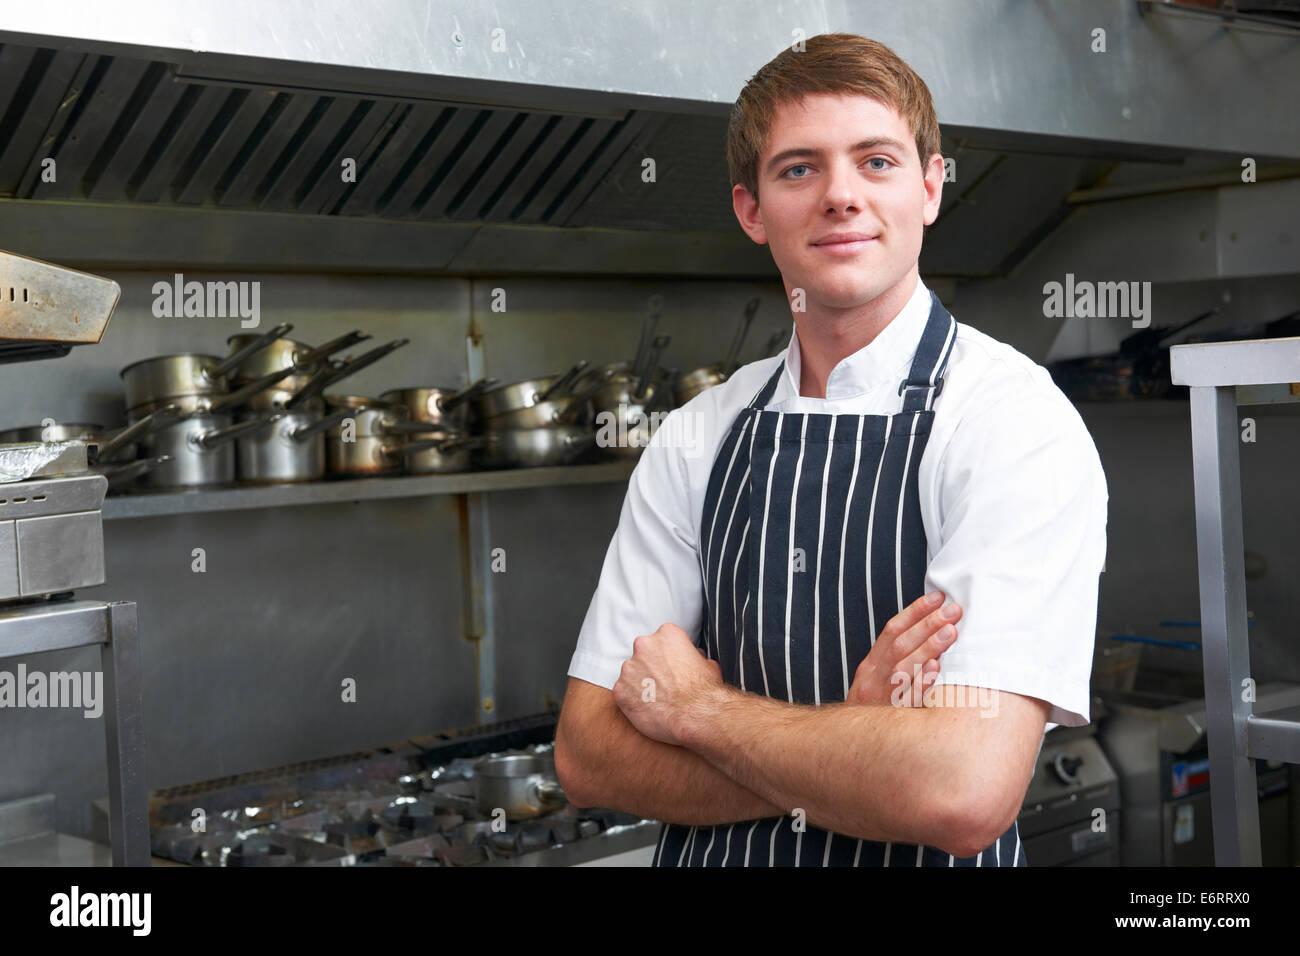 Portrait Of Chef In Restaurant Kitchen - Stock Image